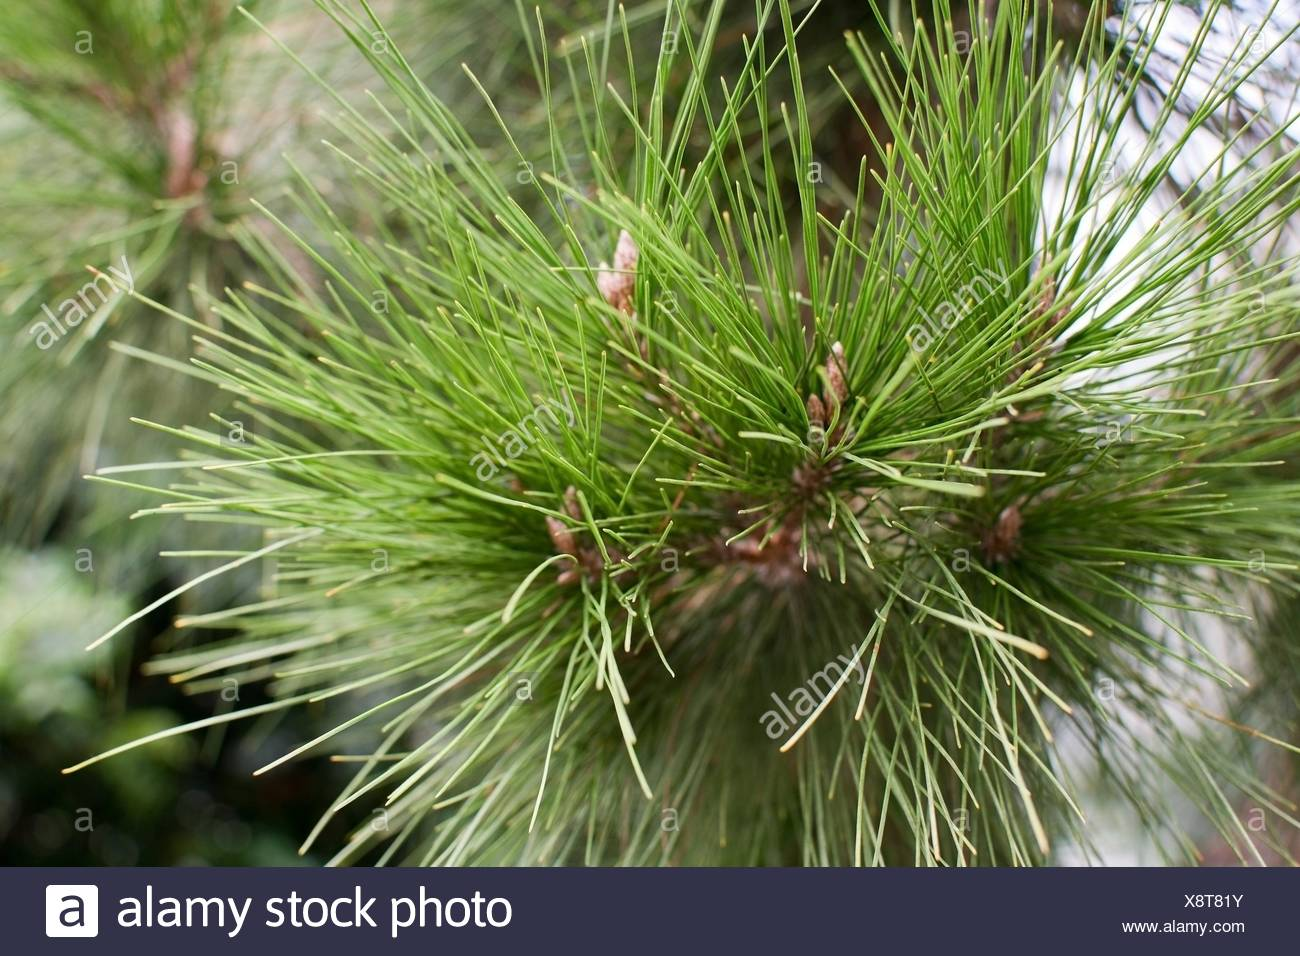 Aleppo pine closeup Pinus halepensis with copy space. - Stock Image